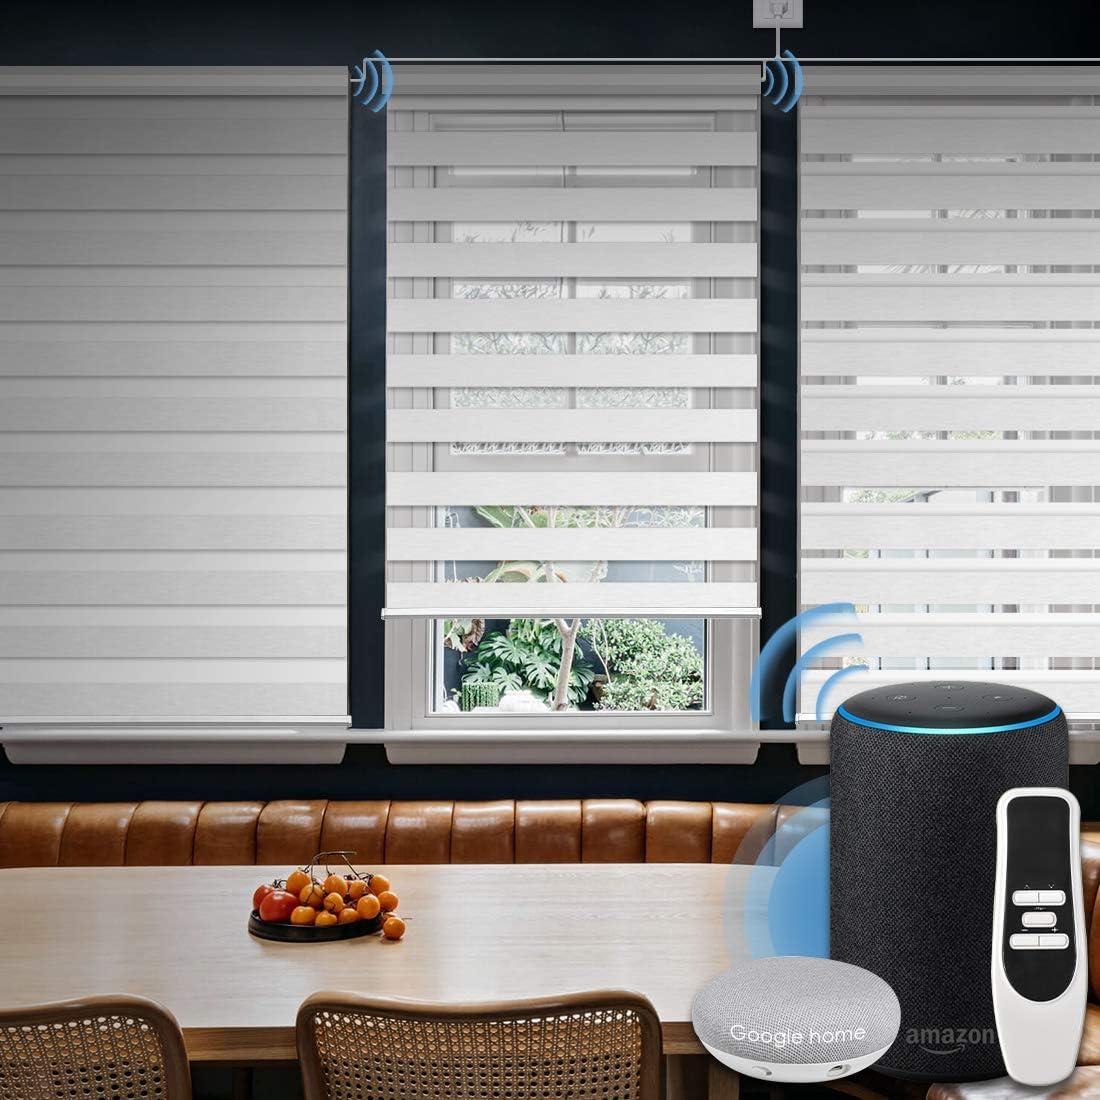 Graywind Motorized Zebra Sheer Shade with Alexa Google WiFi Smart Home Hardwired Plug-in Horizontal Window Blinds Window Shades Light Filtering Window Blinds, Customized Size White